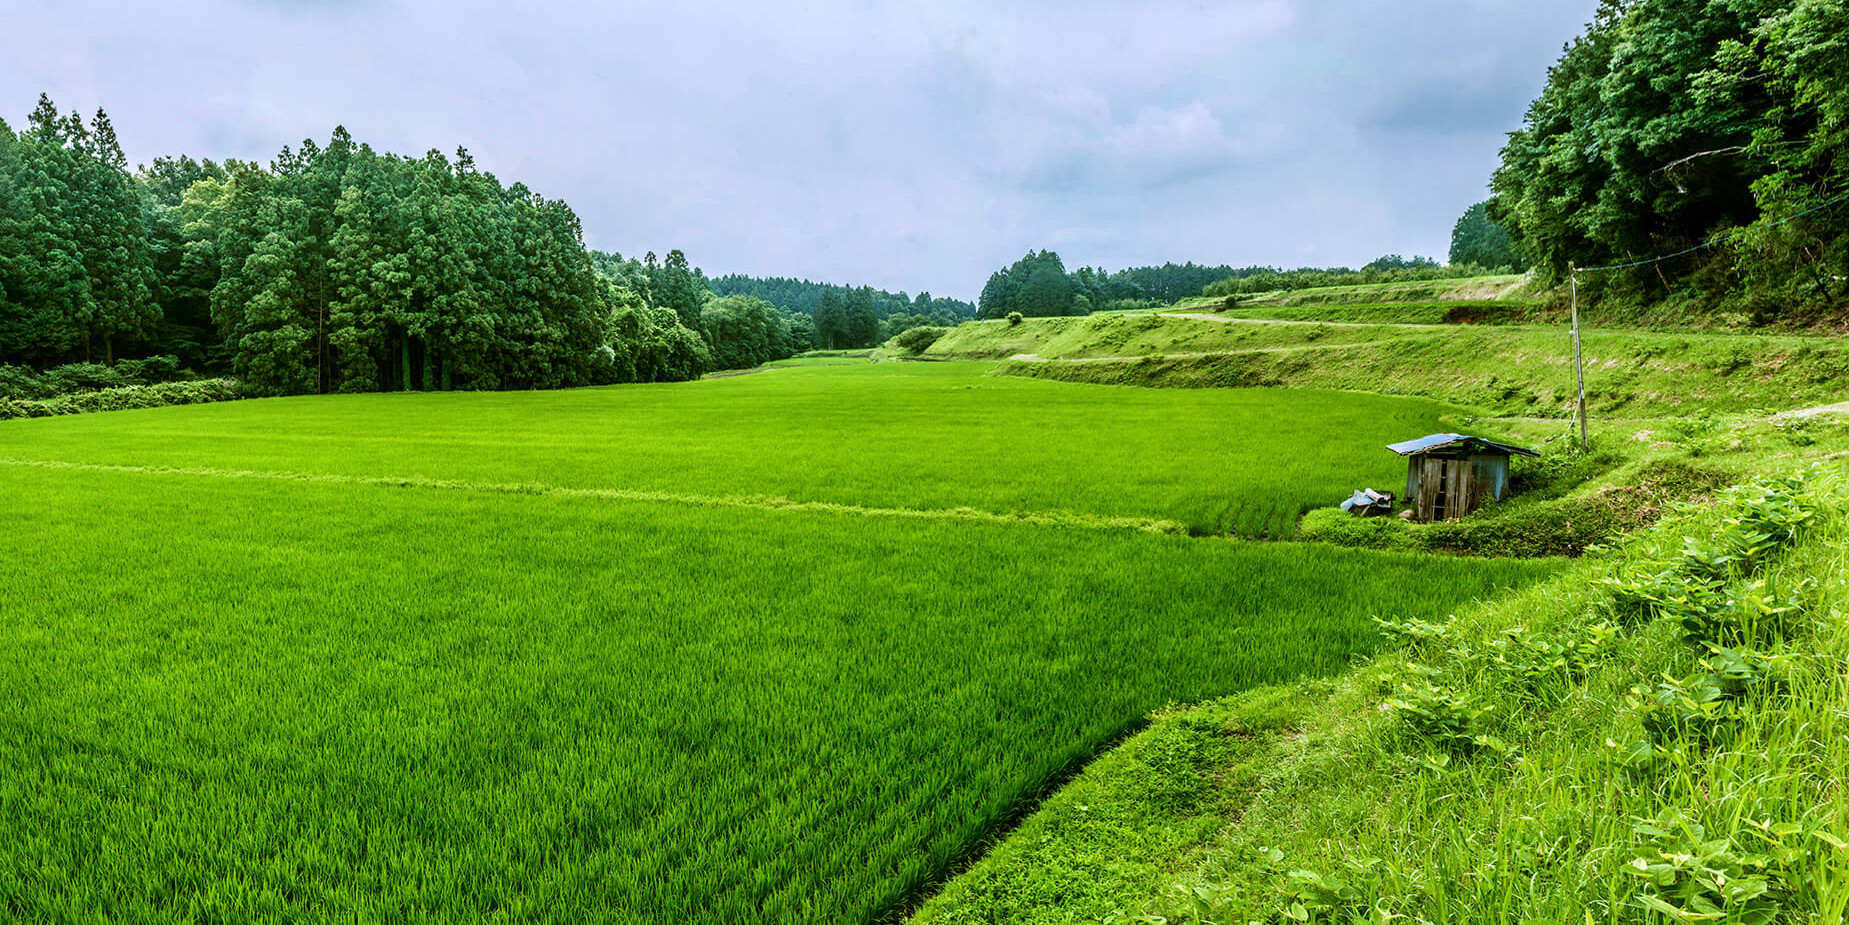 Japan - Rice Field in Fukushima Prefecture